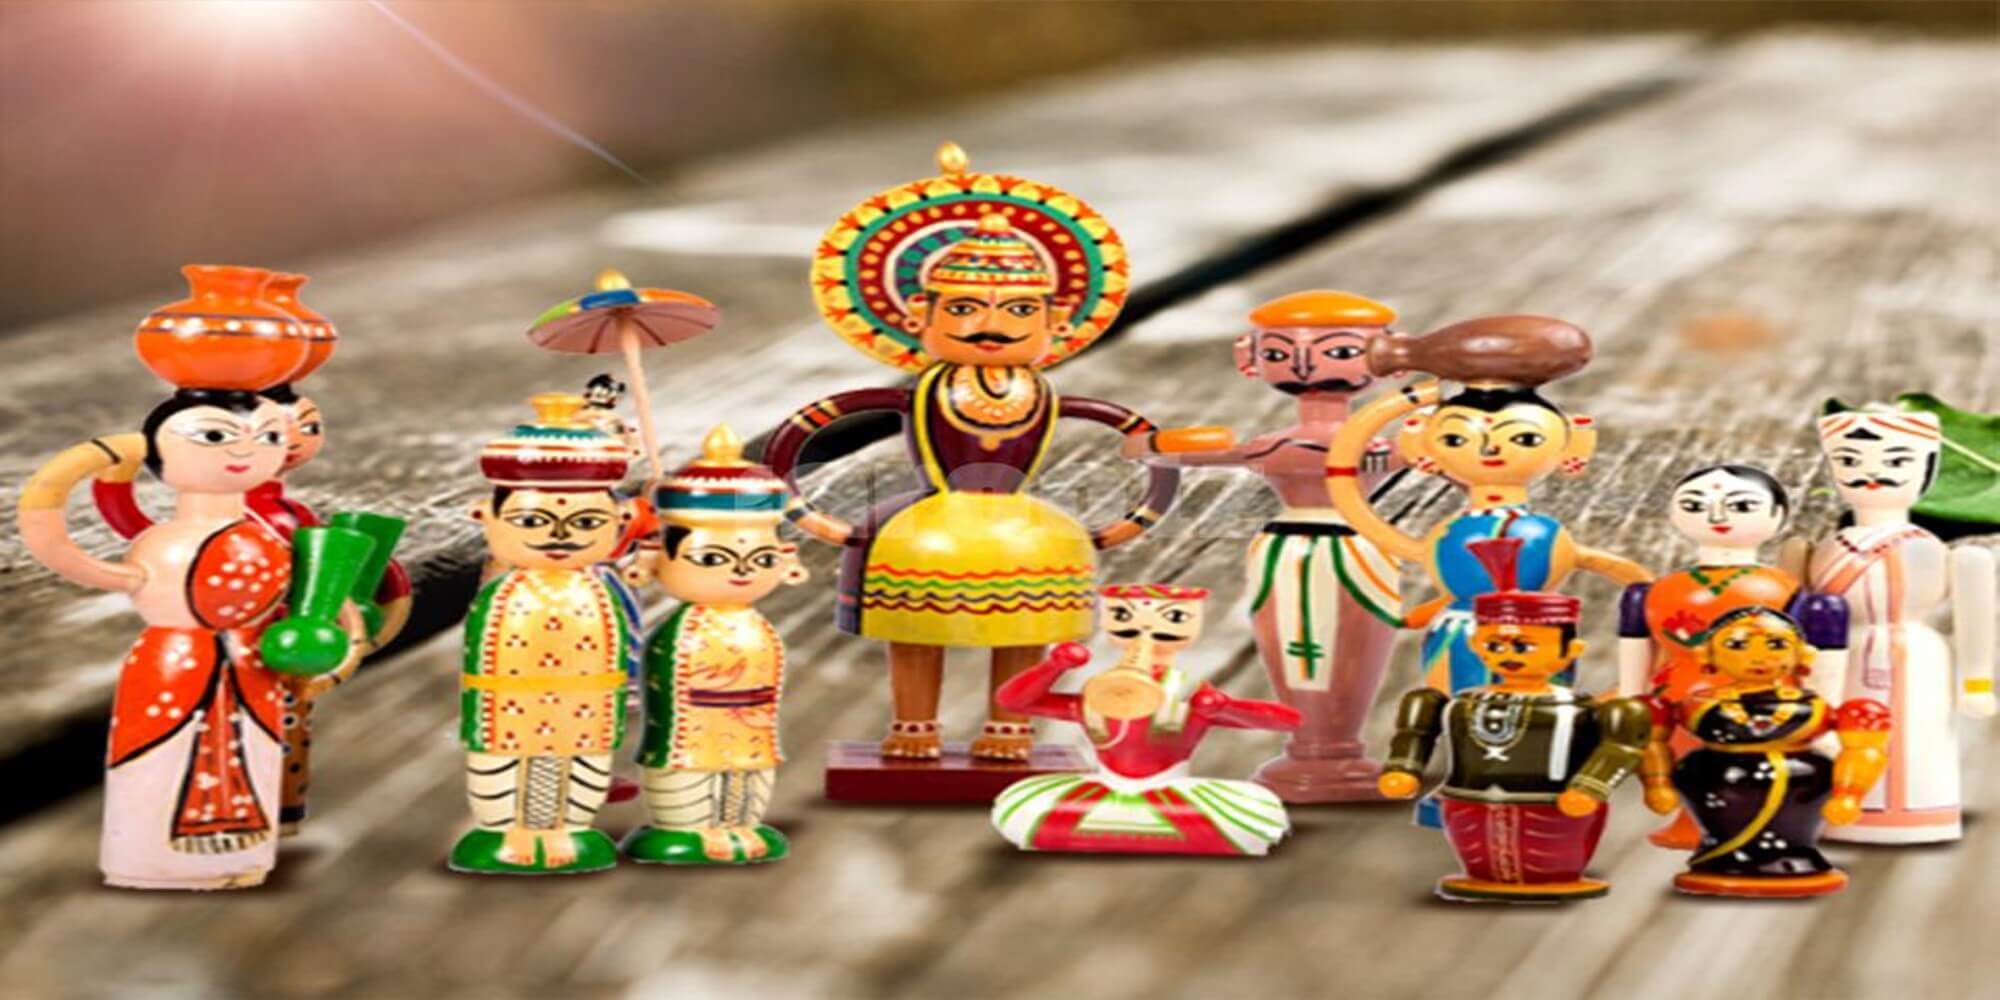 channapatna toys image